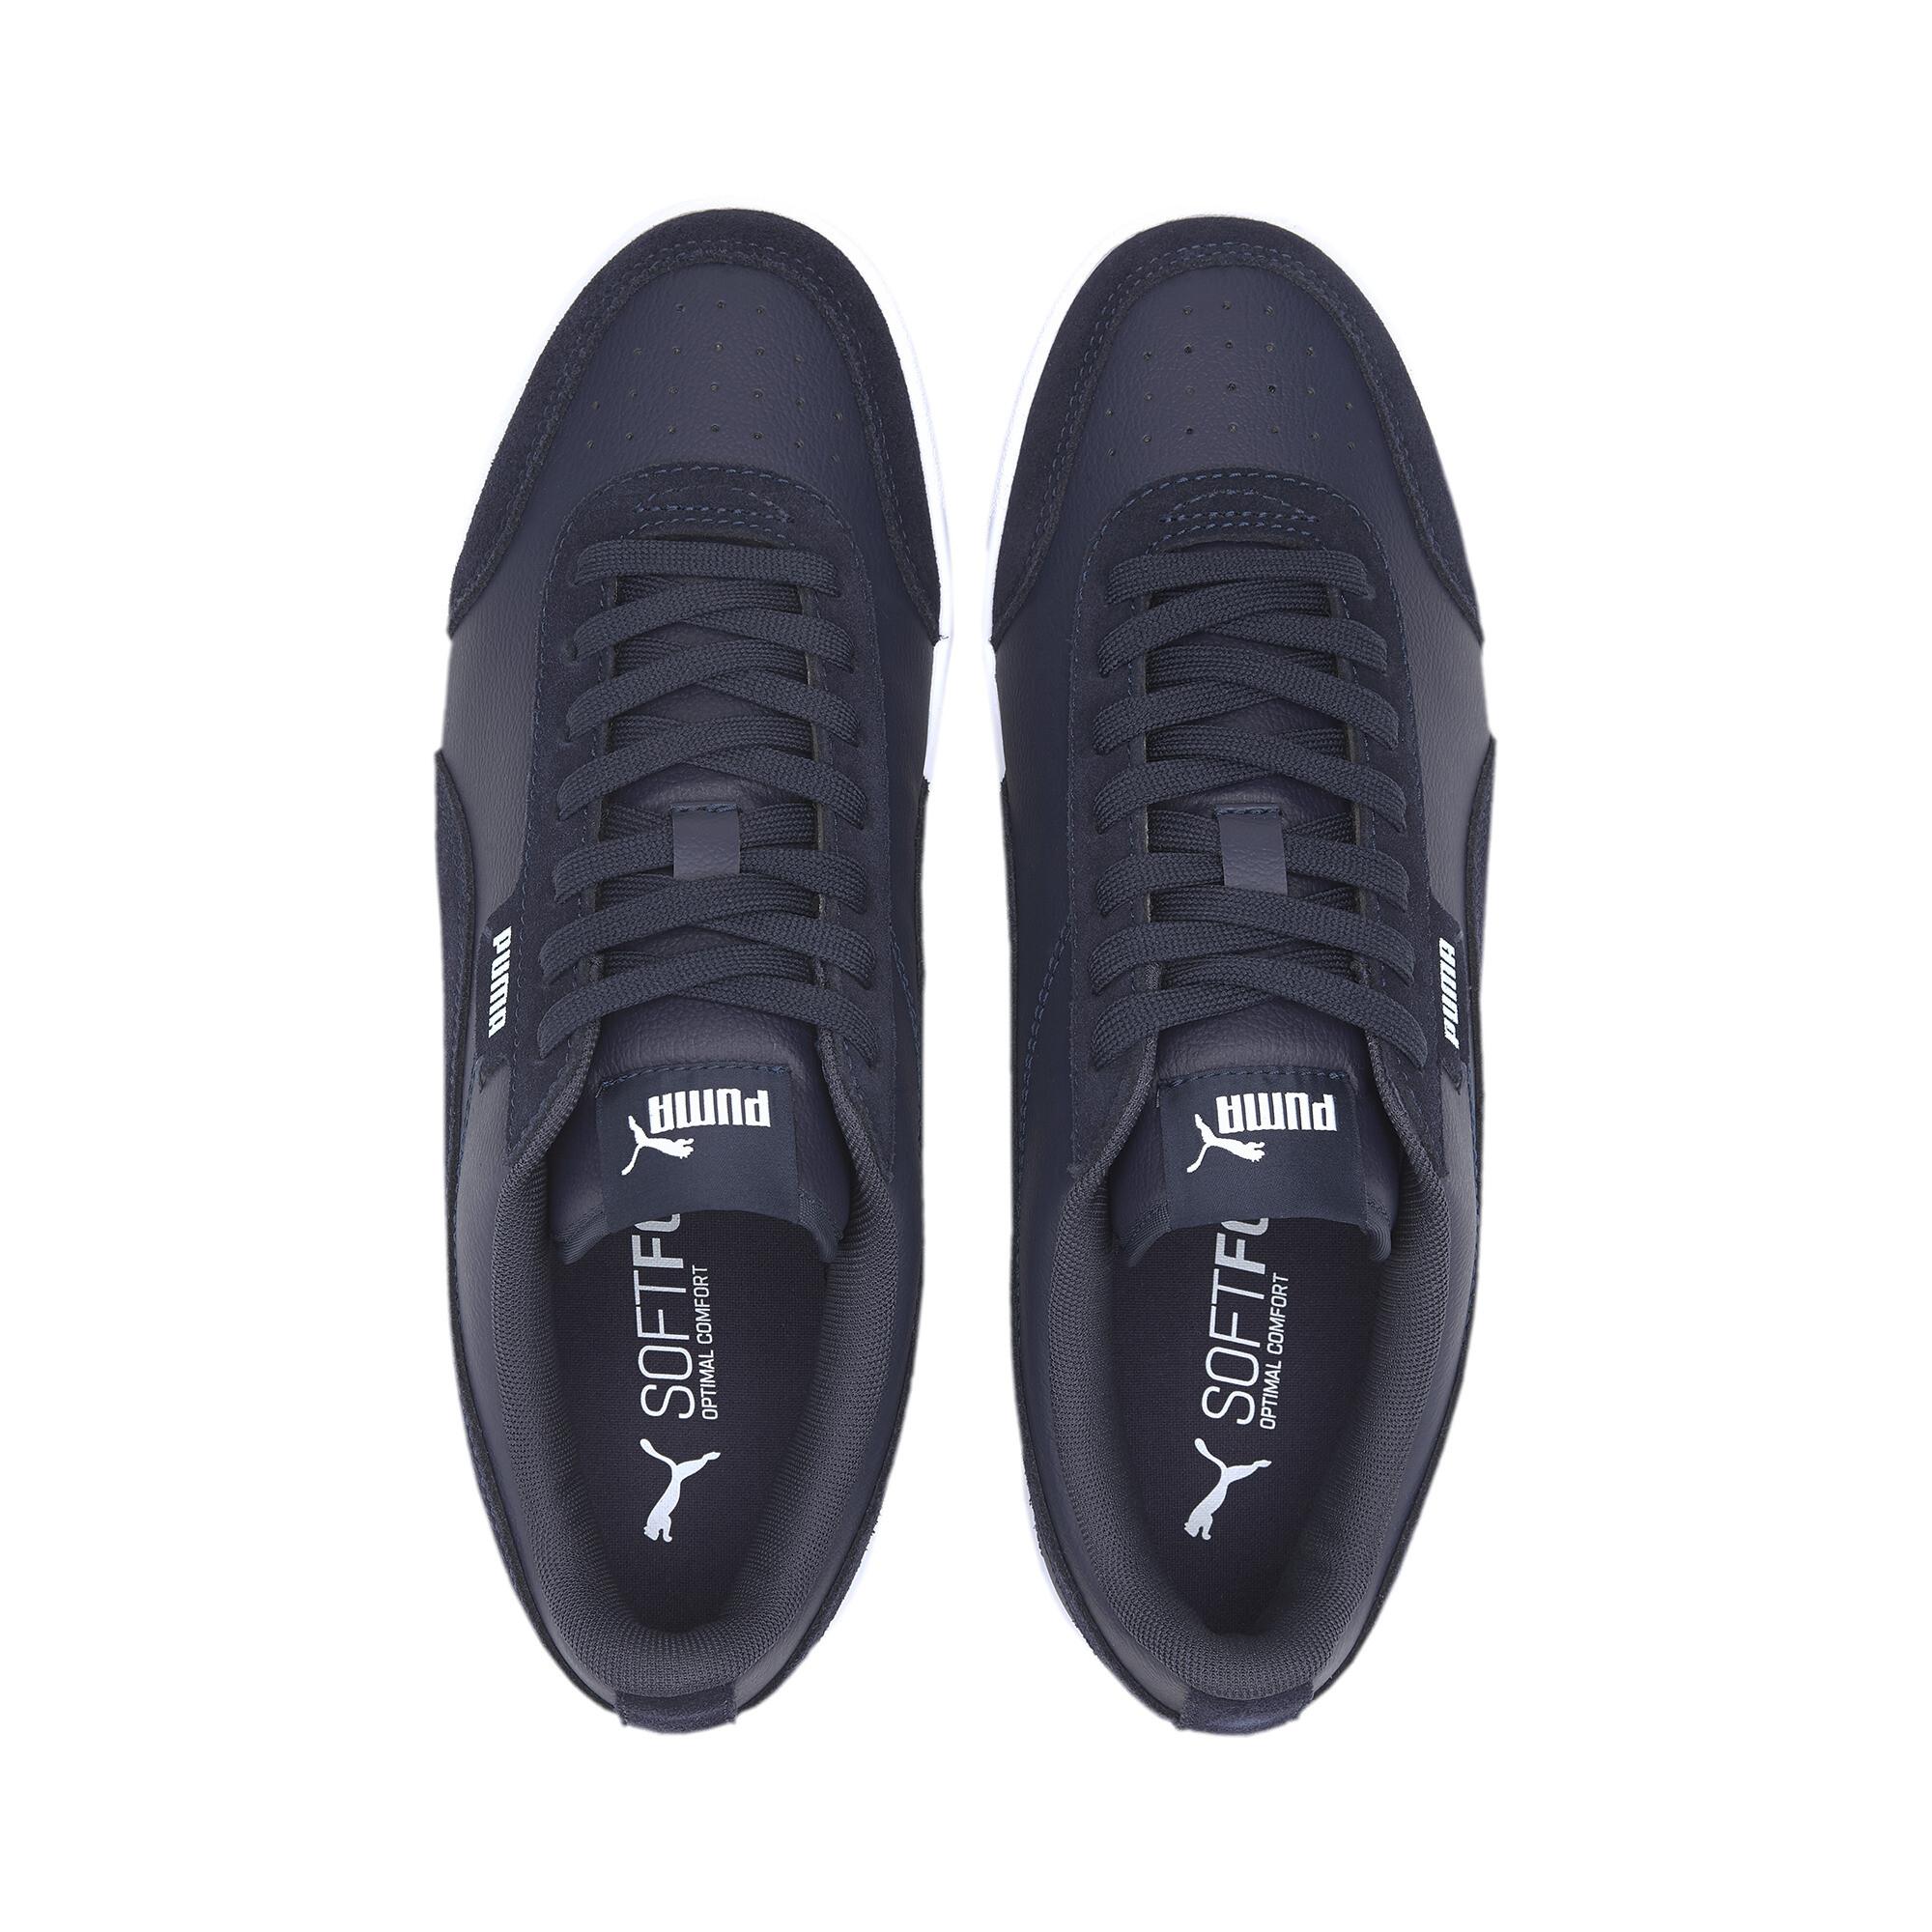 Indexbild 20 - PUMA Court Legend Lo Sneaker Unisex Schuhe Basics Neu